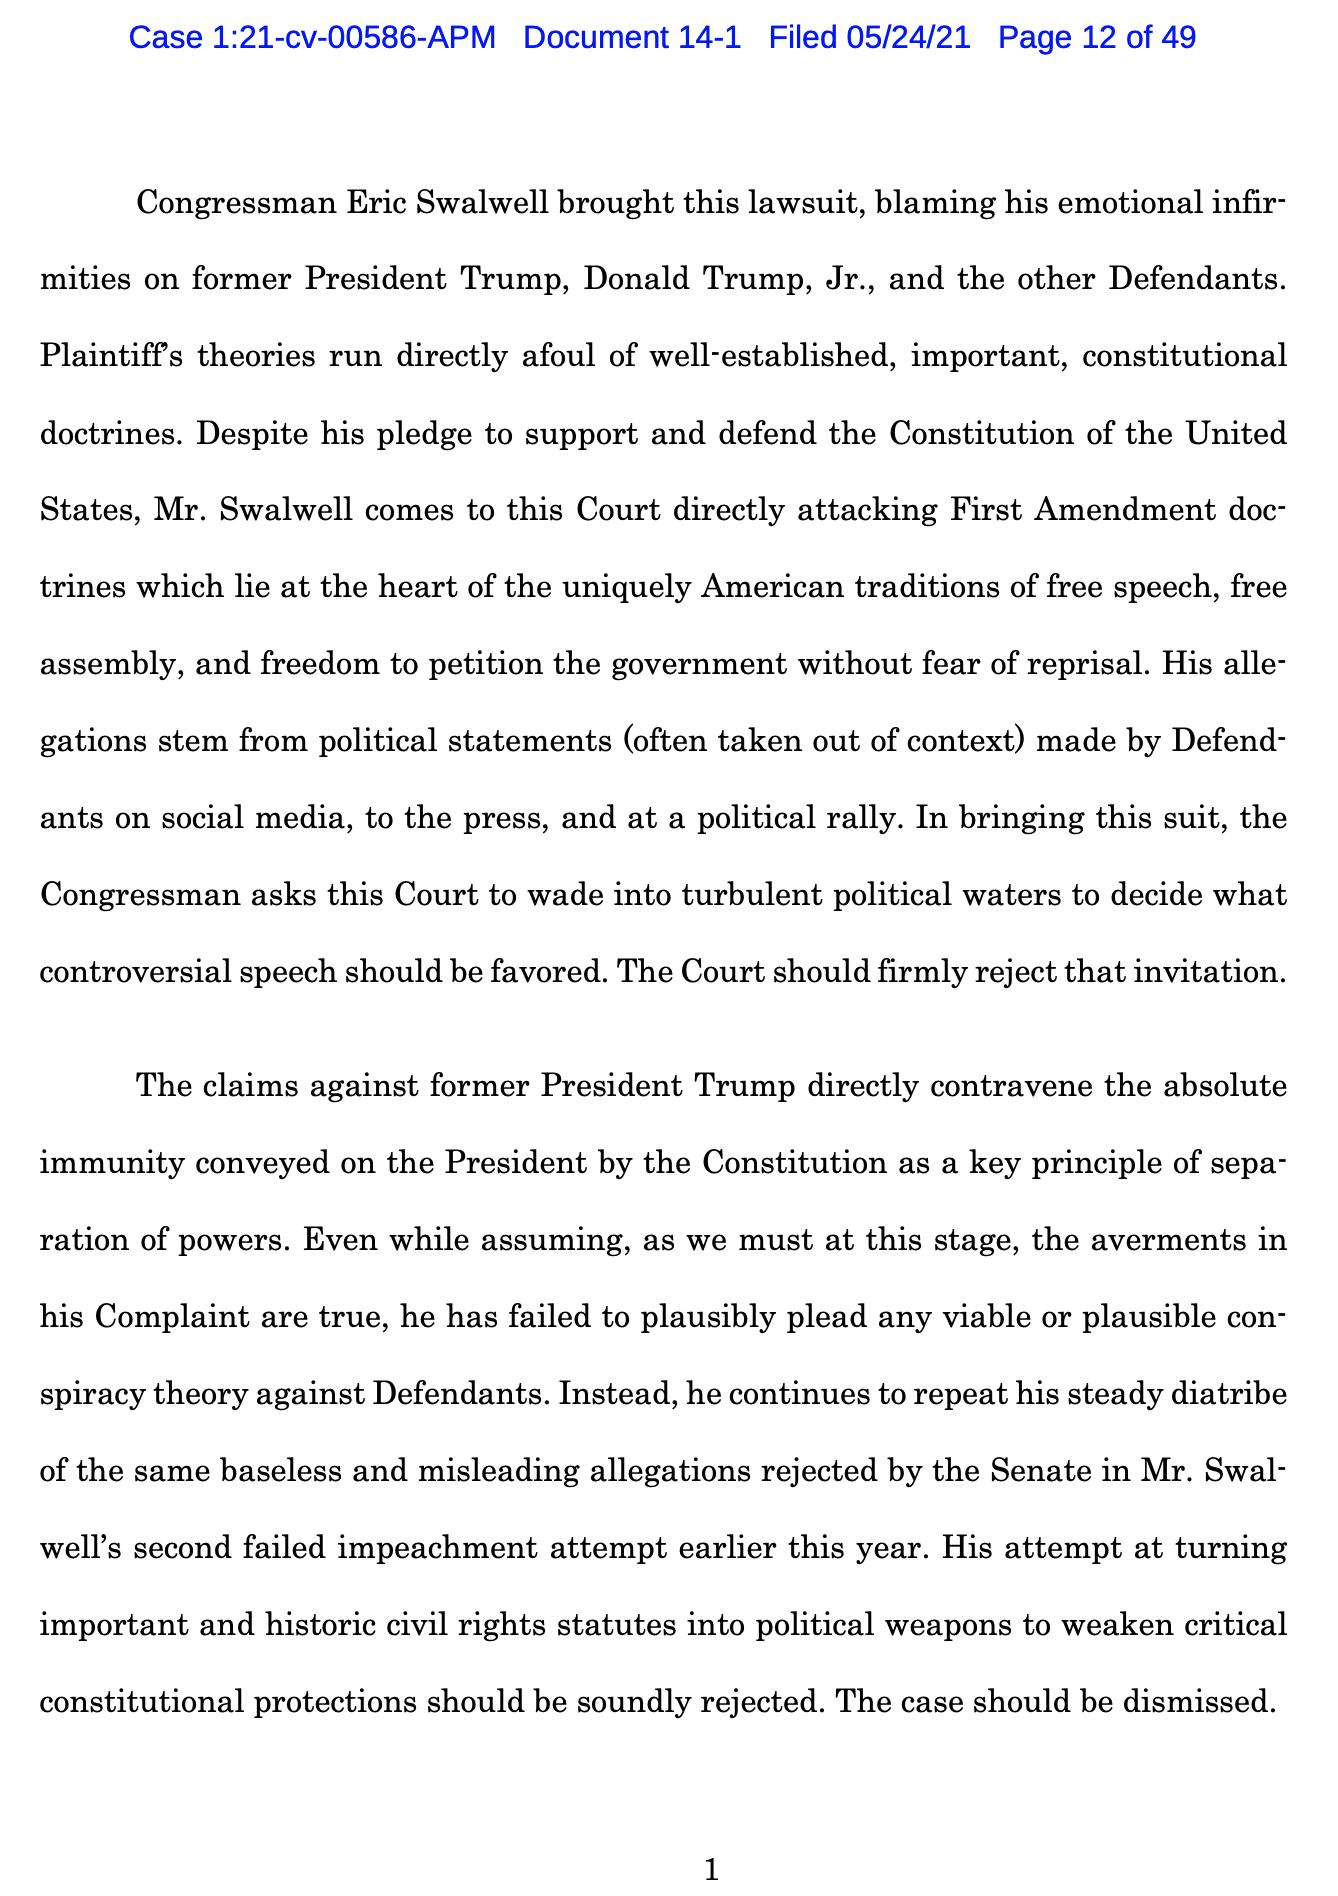 Screen-Shot-2021-05-25-at-9.48.33-AM Trump Declares Full Immunity From Jan. 6 Insurrection Lawsuit Crime Donald Trump Featured Politics Top Stories